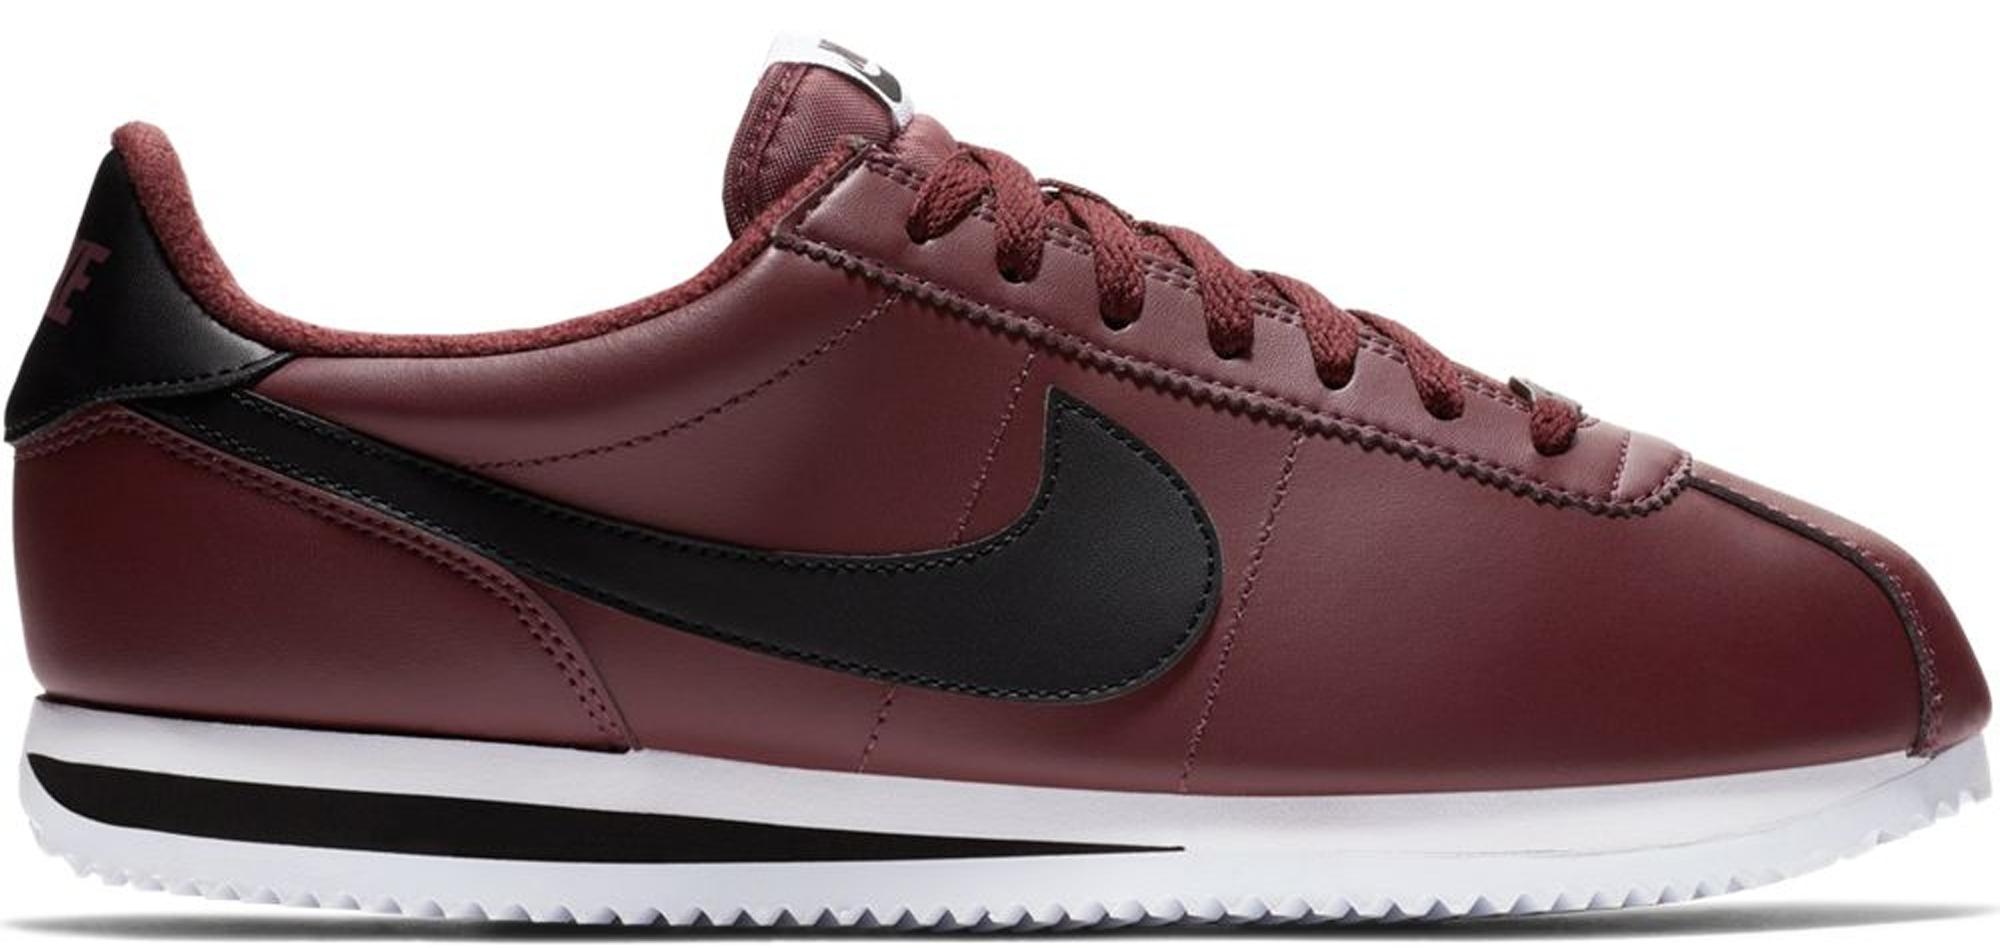 Nike Cortez Leather Burgundy Crush